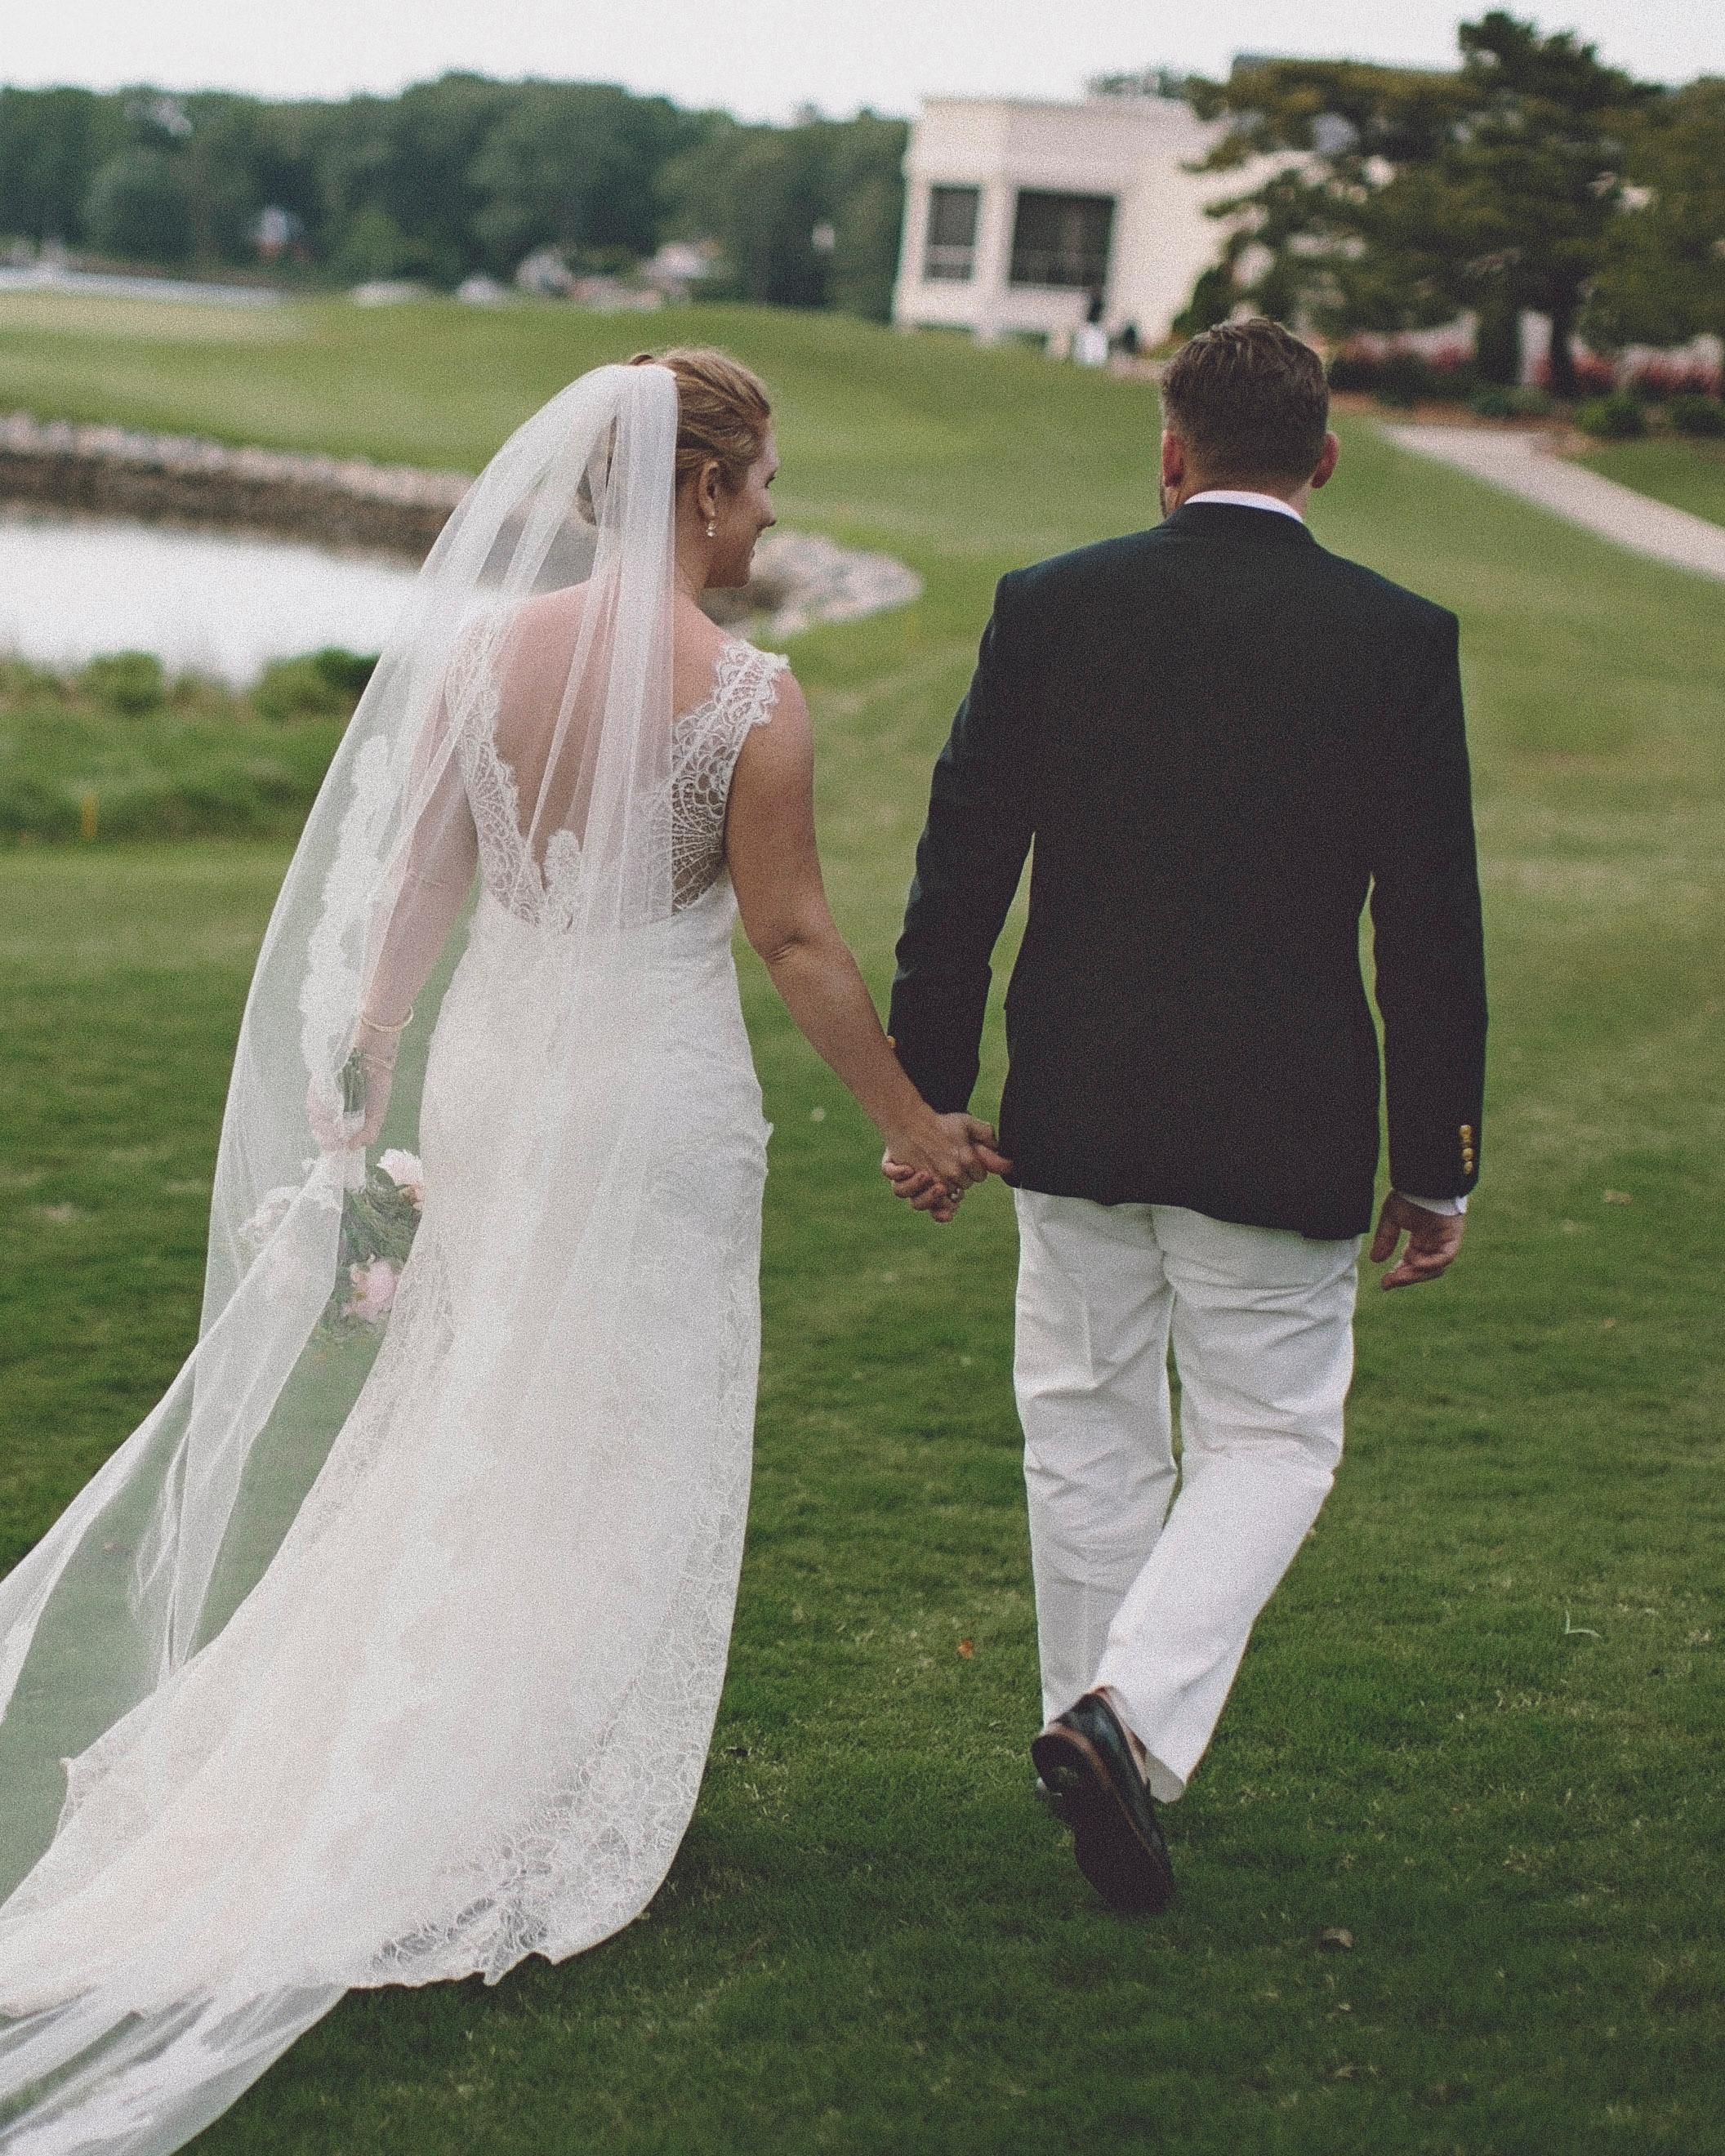 molly-greg-wedding-walking-00062-s111481-0814.jpg